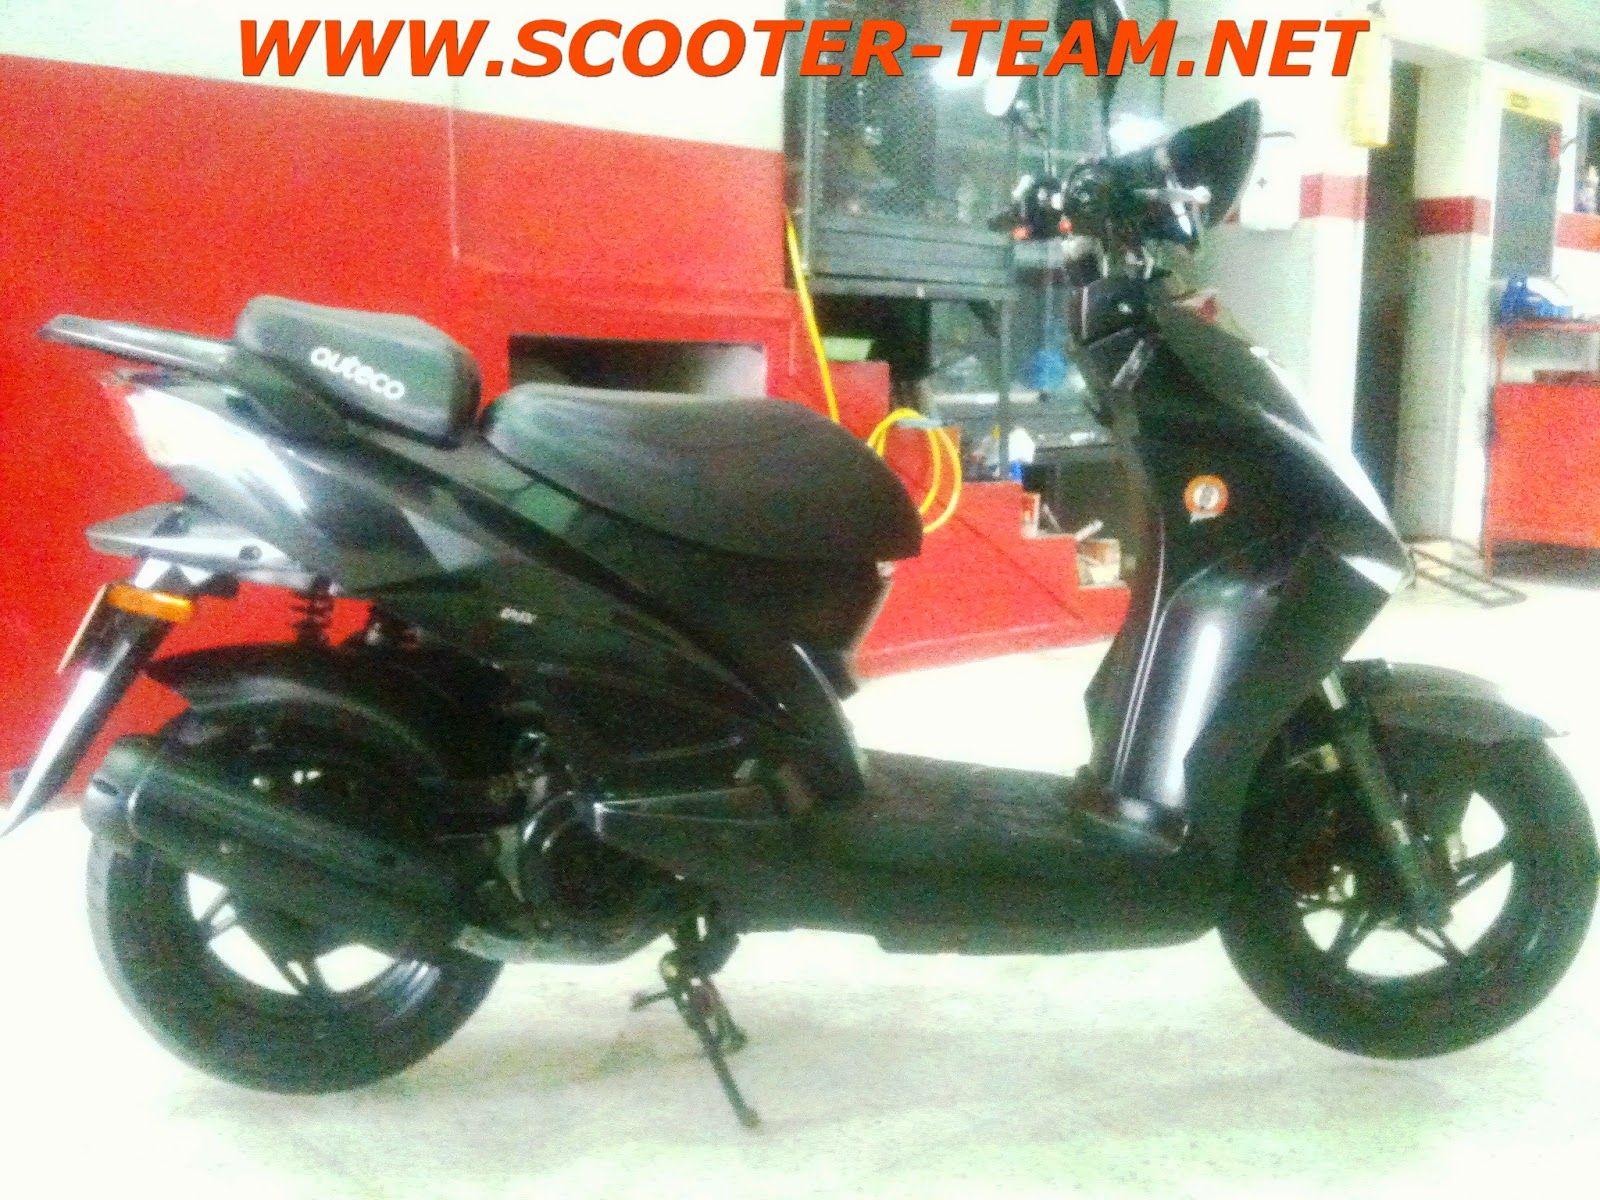 Scooter Team: VENDO KYMCO AGILITY RS NAKED 160cc - 2012